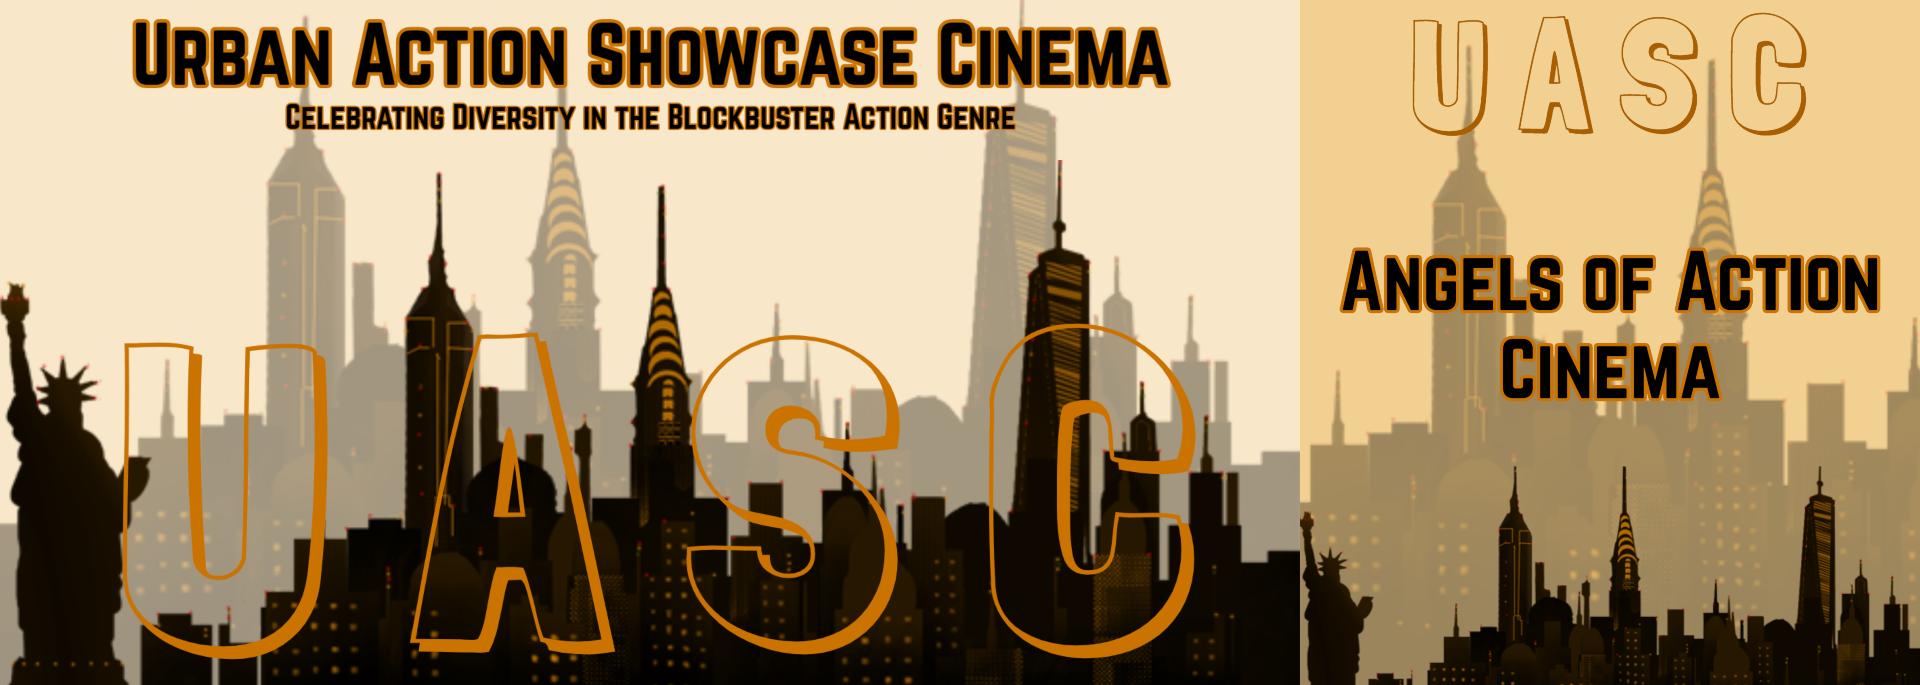 UASC: Angels Of Action Cinema